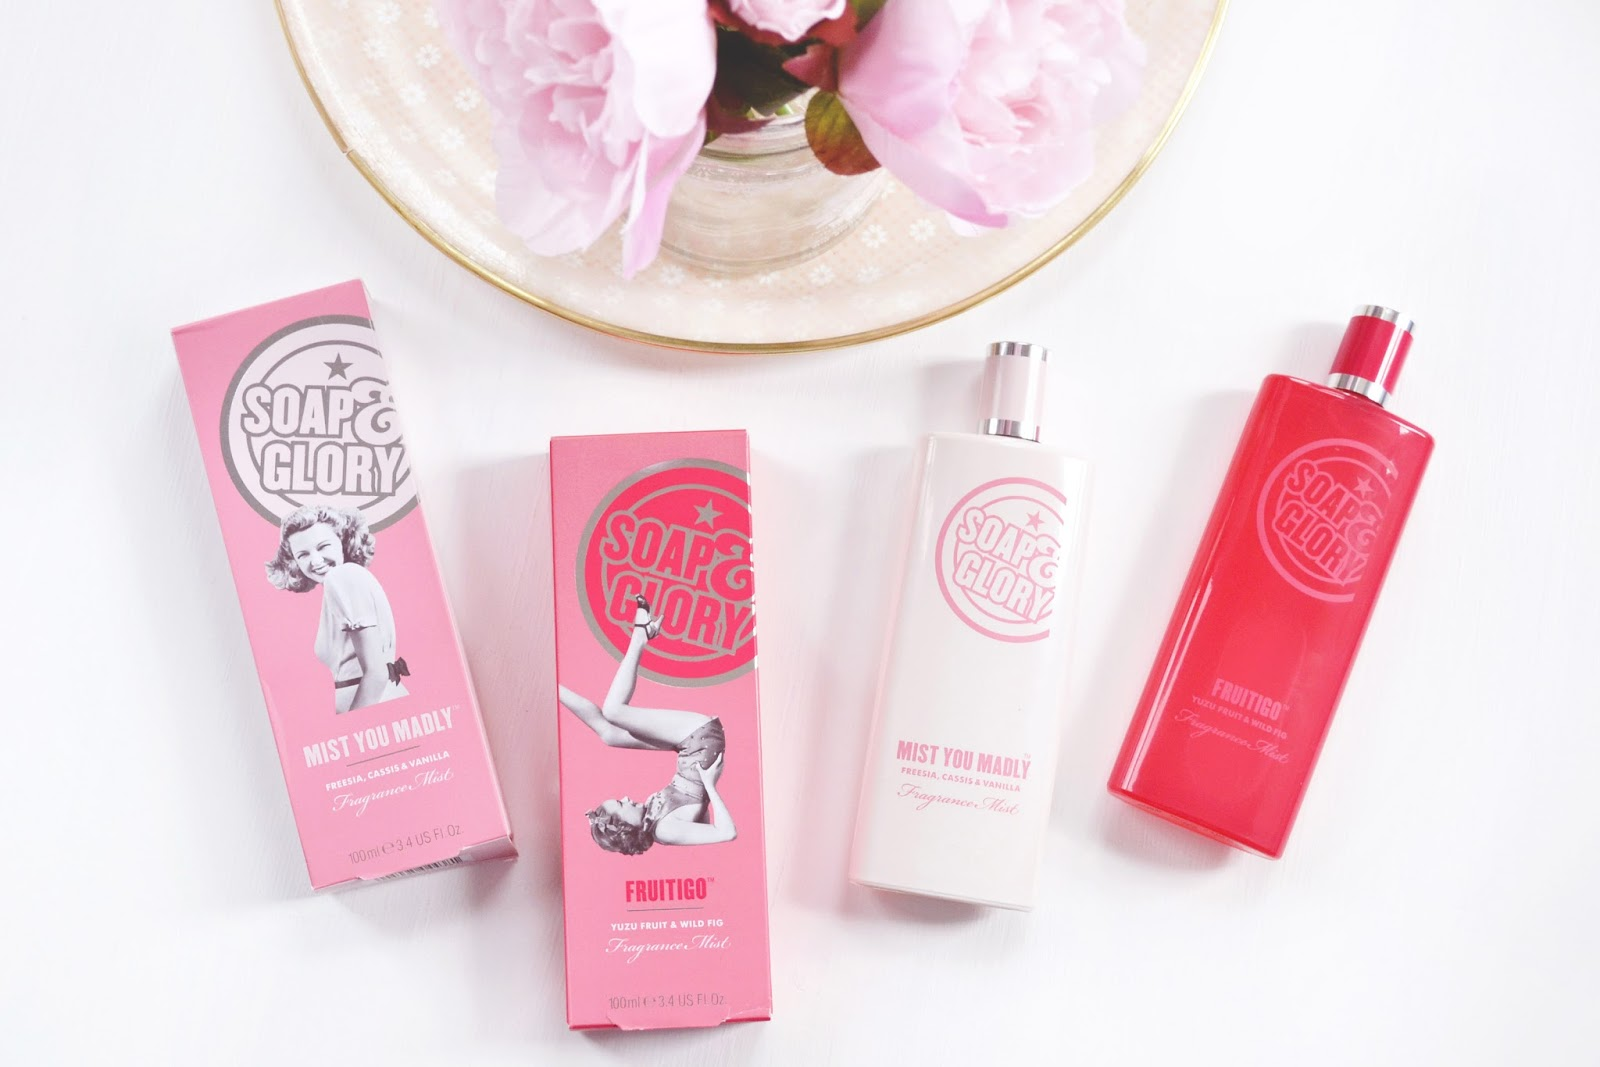 soap&glory fragrance mist